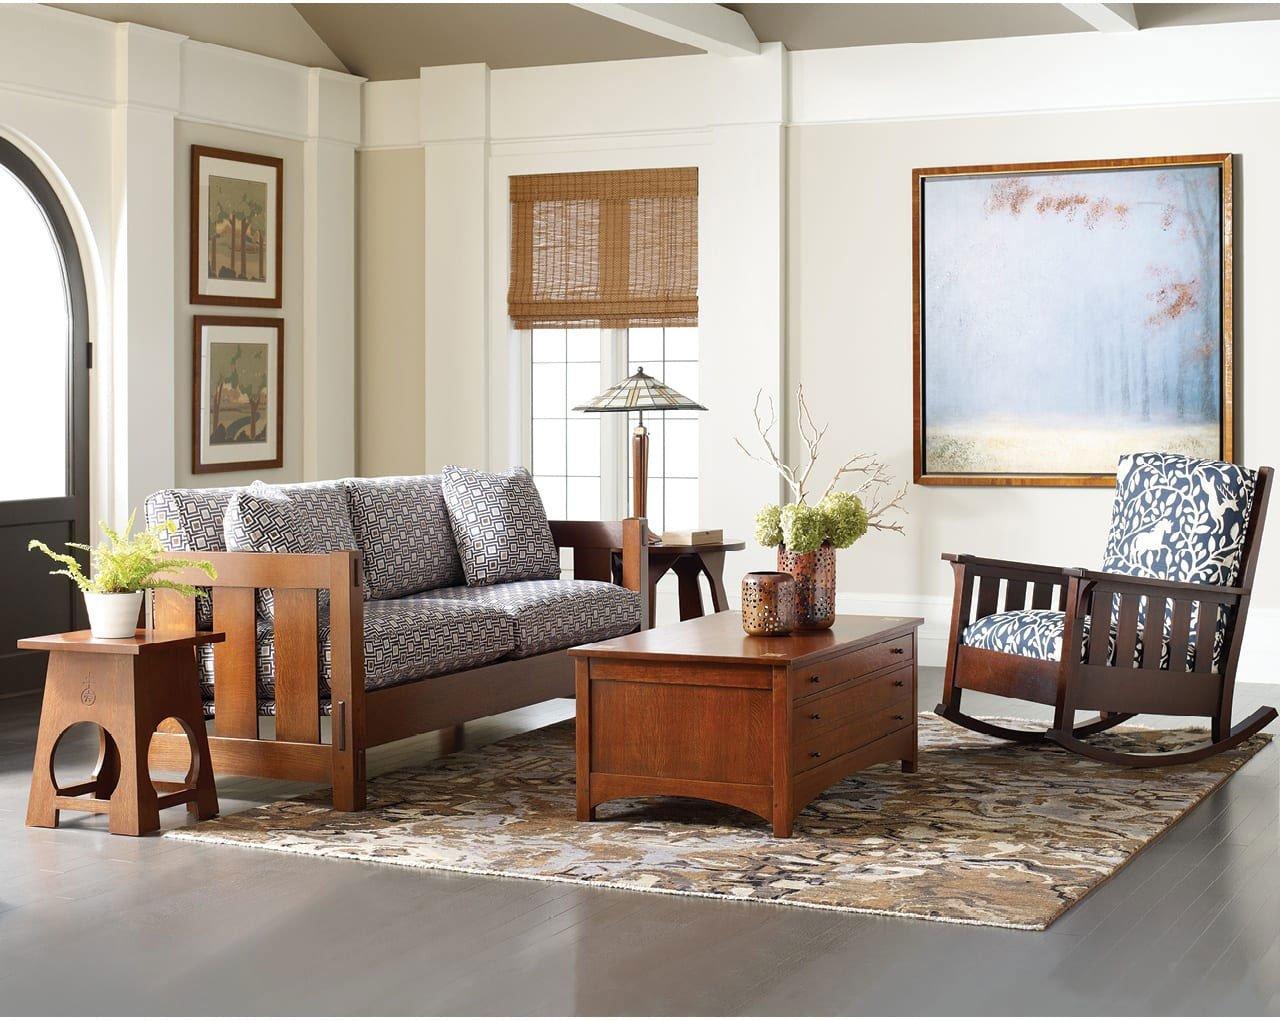 Stickley Heirloom furniture